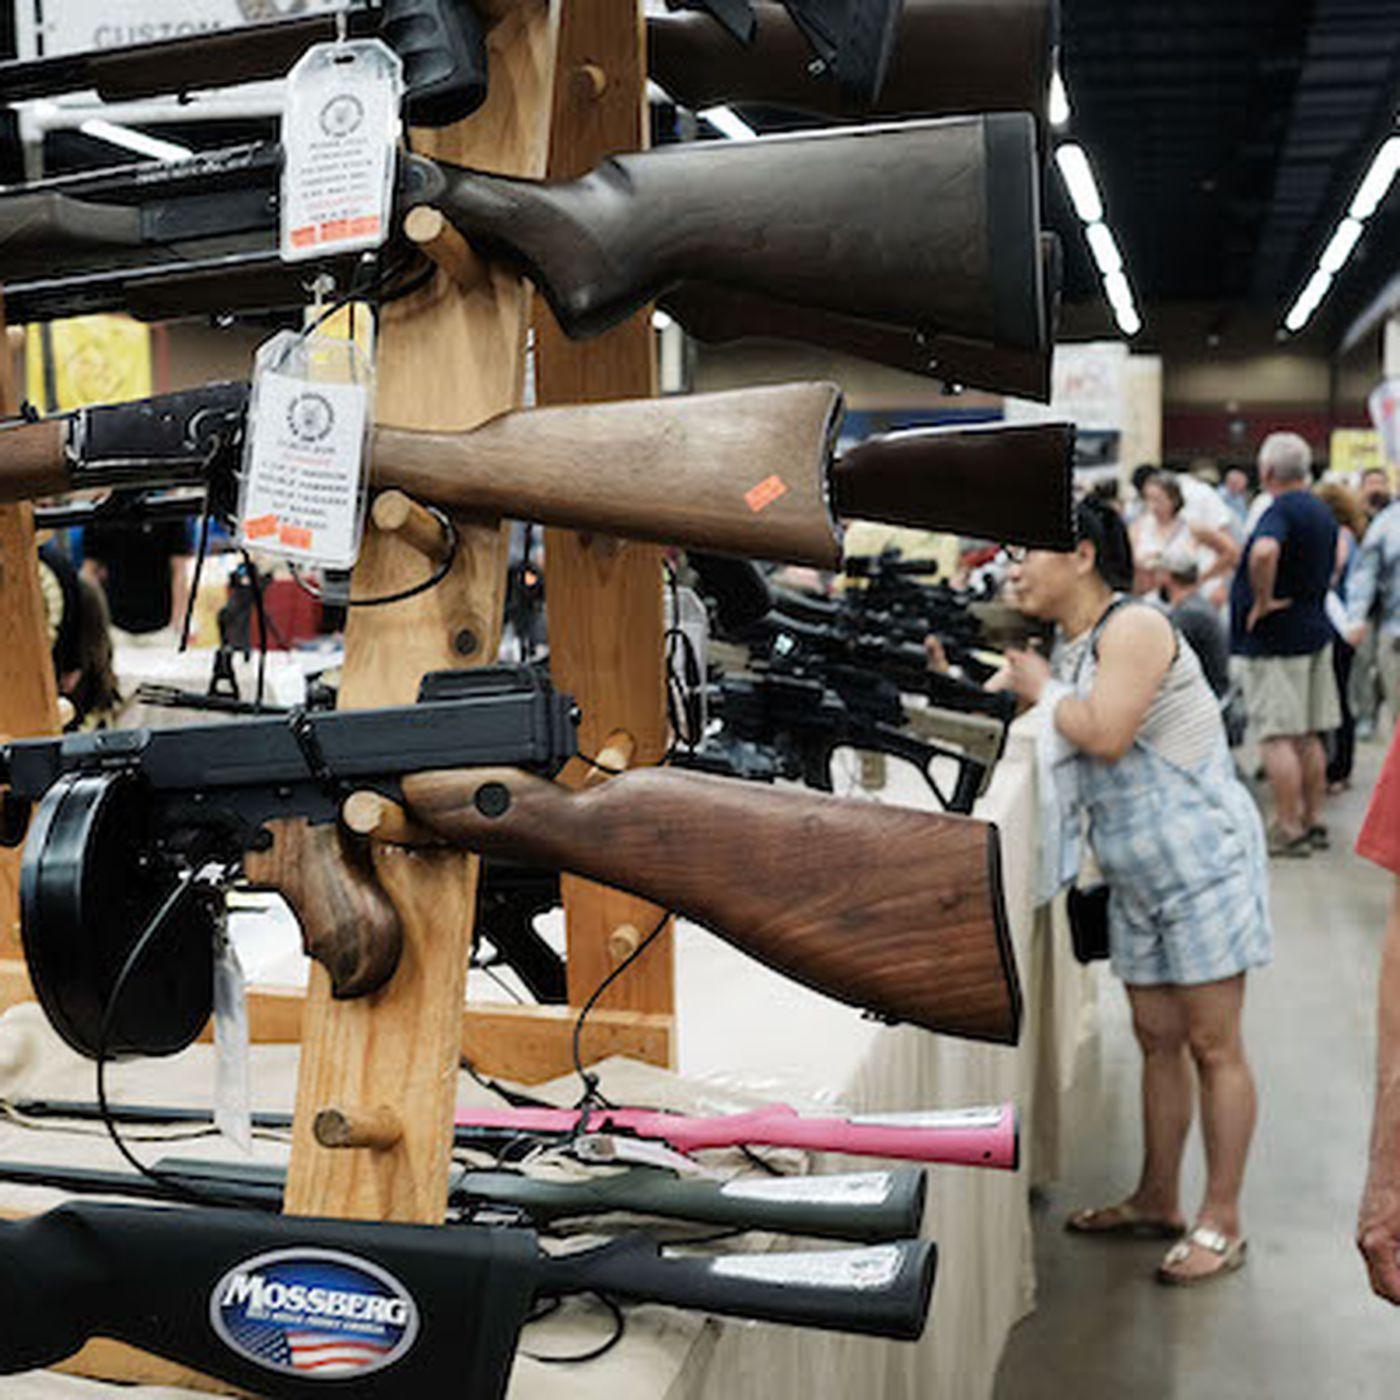 Vox Sentences: Texas's answer to shootings: more guns - Vox